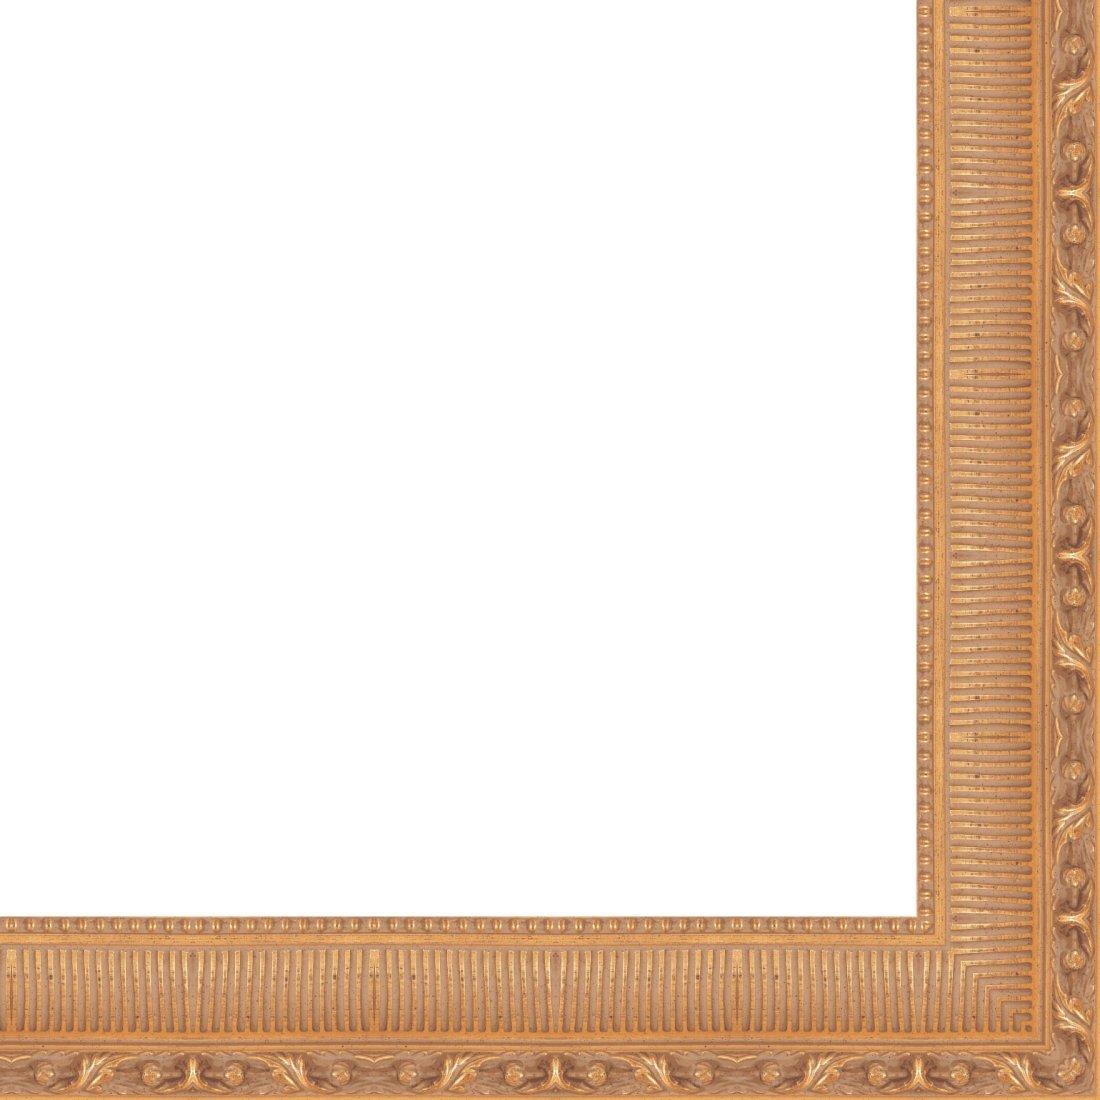 Picture Frame Moulding (Wood) 18ft bundle - Traditional Antique Gold Finish - 4.5'' width - 5/8'' rabbet depth